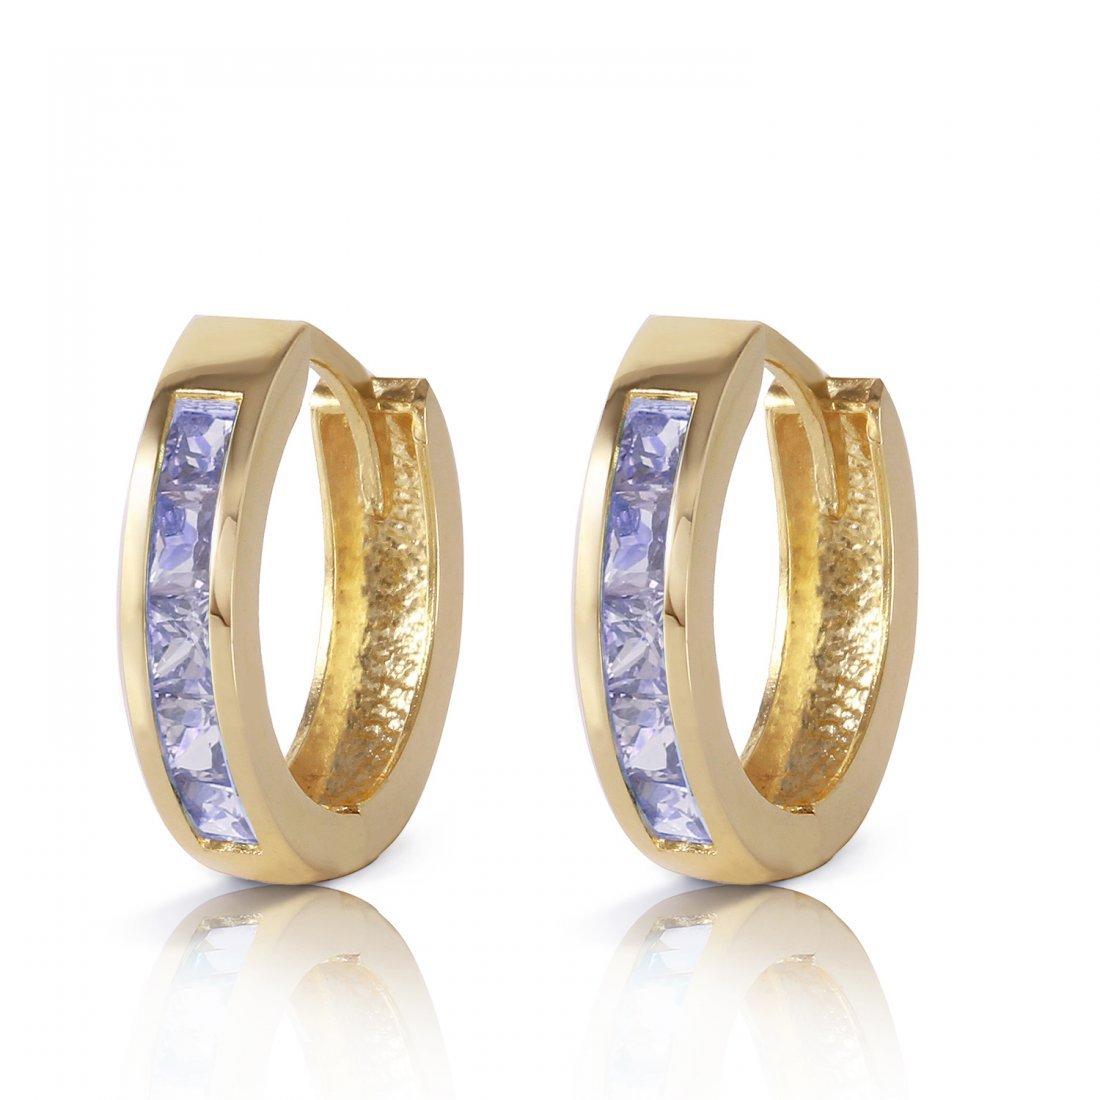 Genuine 0.95 ctw Tanzanite Earrings Jewelry 14KT Yellow